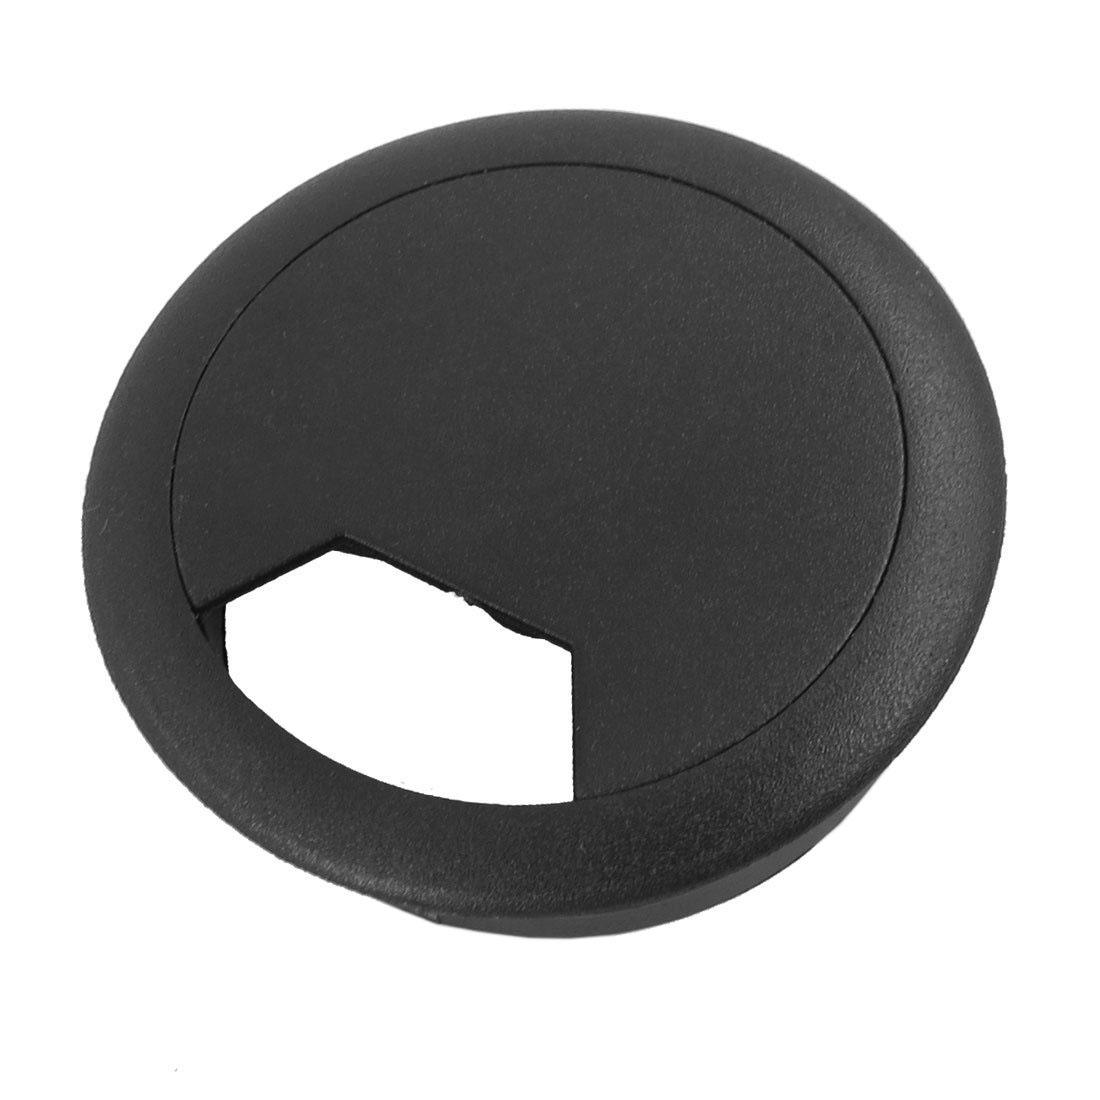 2019 50mm diameter desk wire cord cable grommets hole cover black rh dhgate com